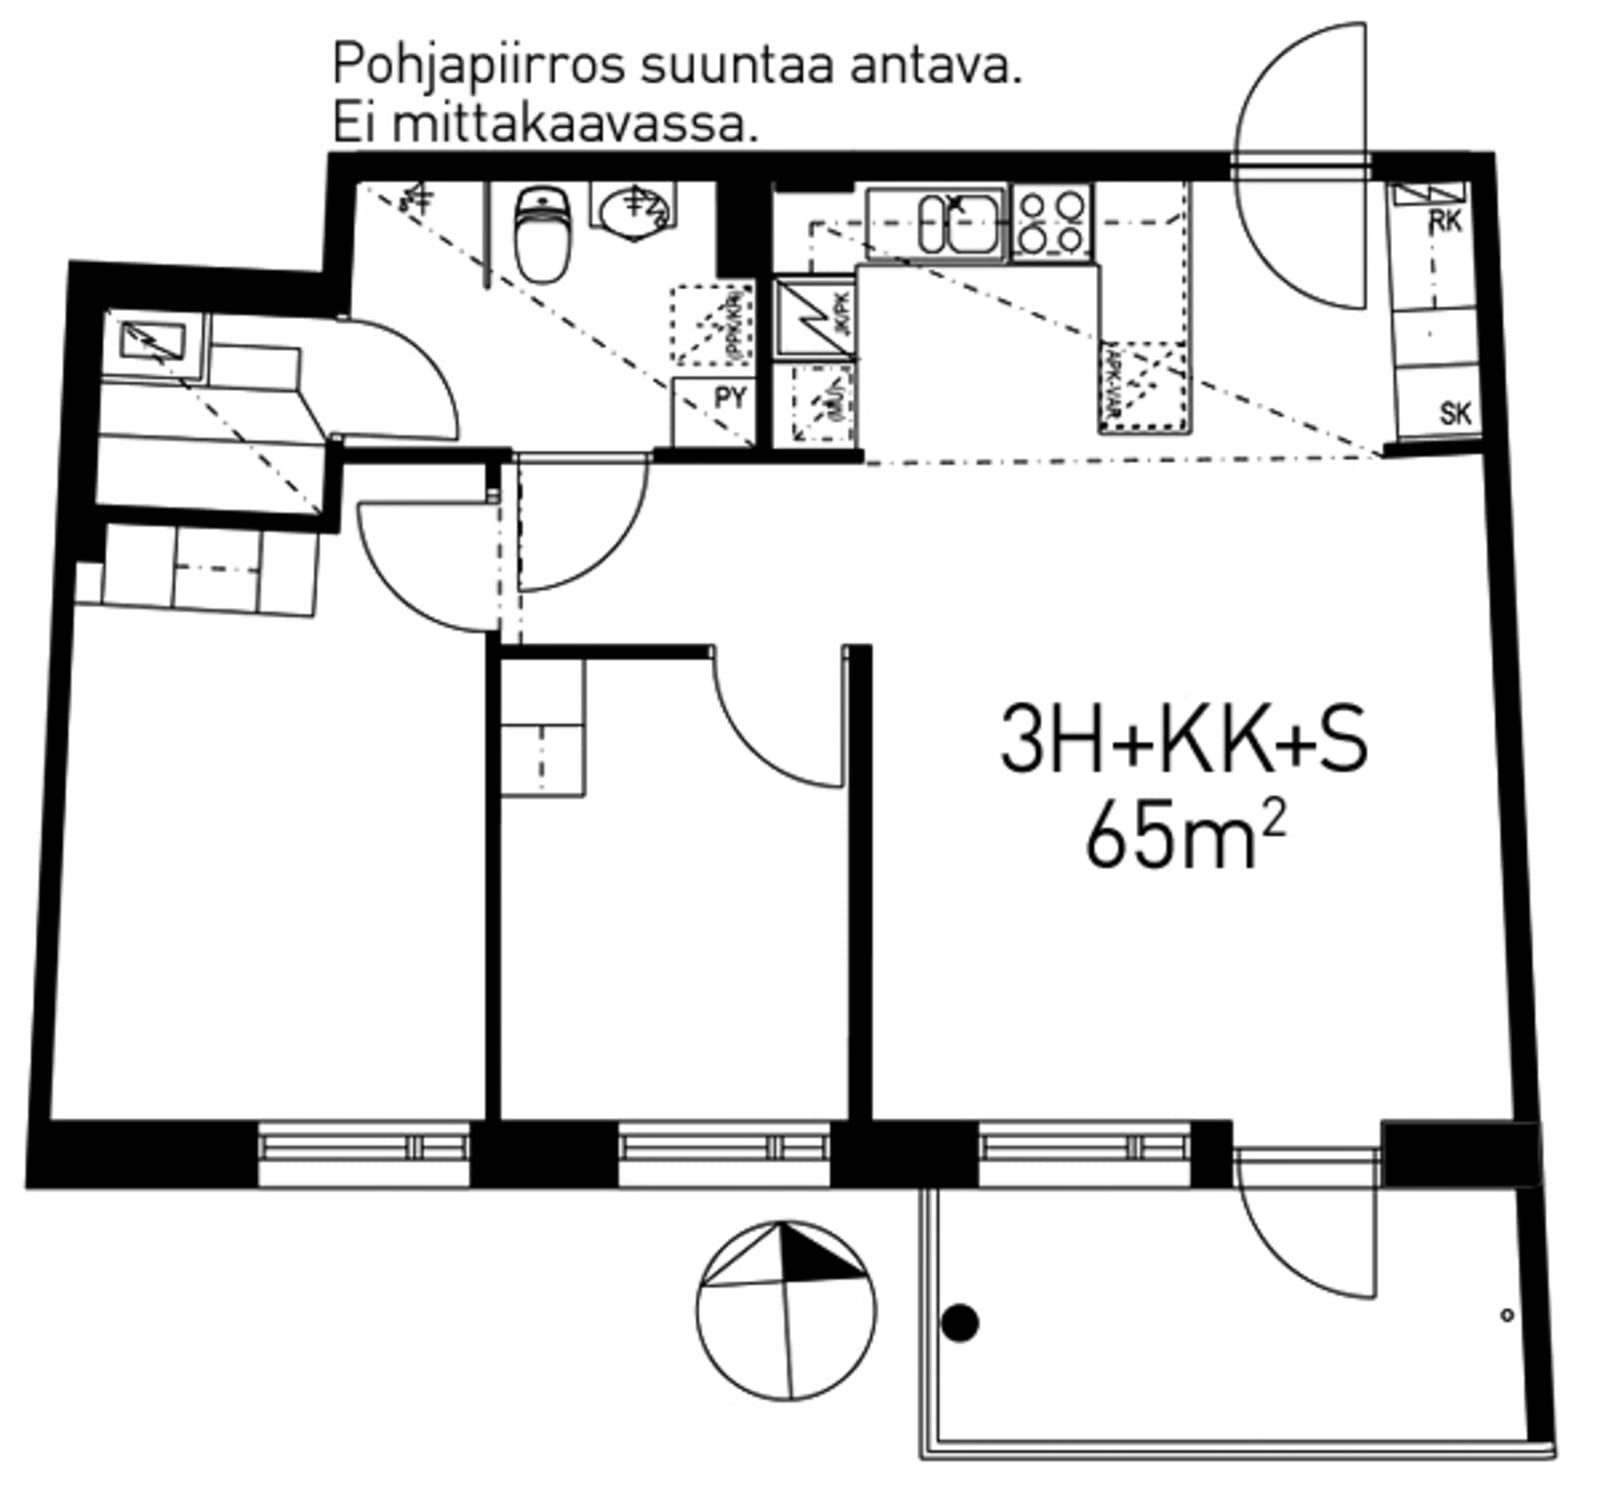 Helsinki, Pitäjänmäki, Kutomotie 8a A 006